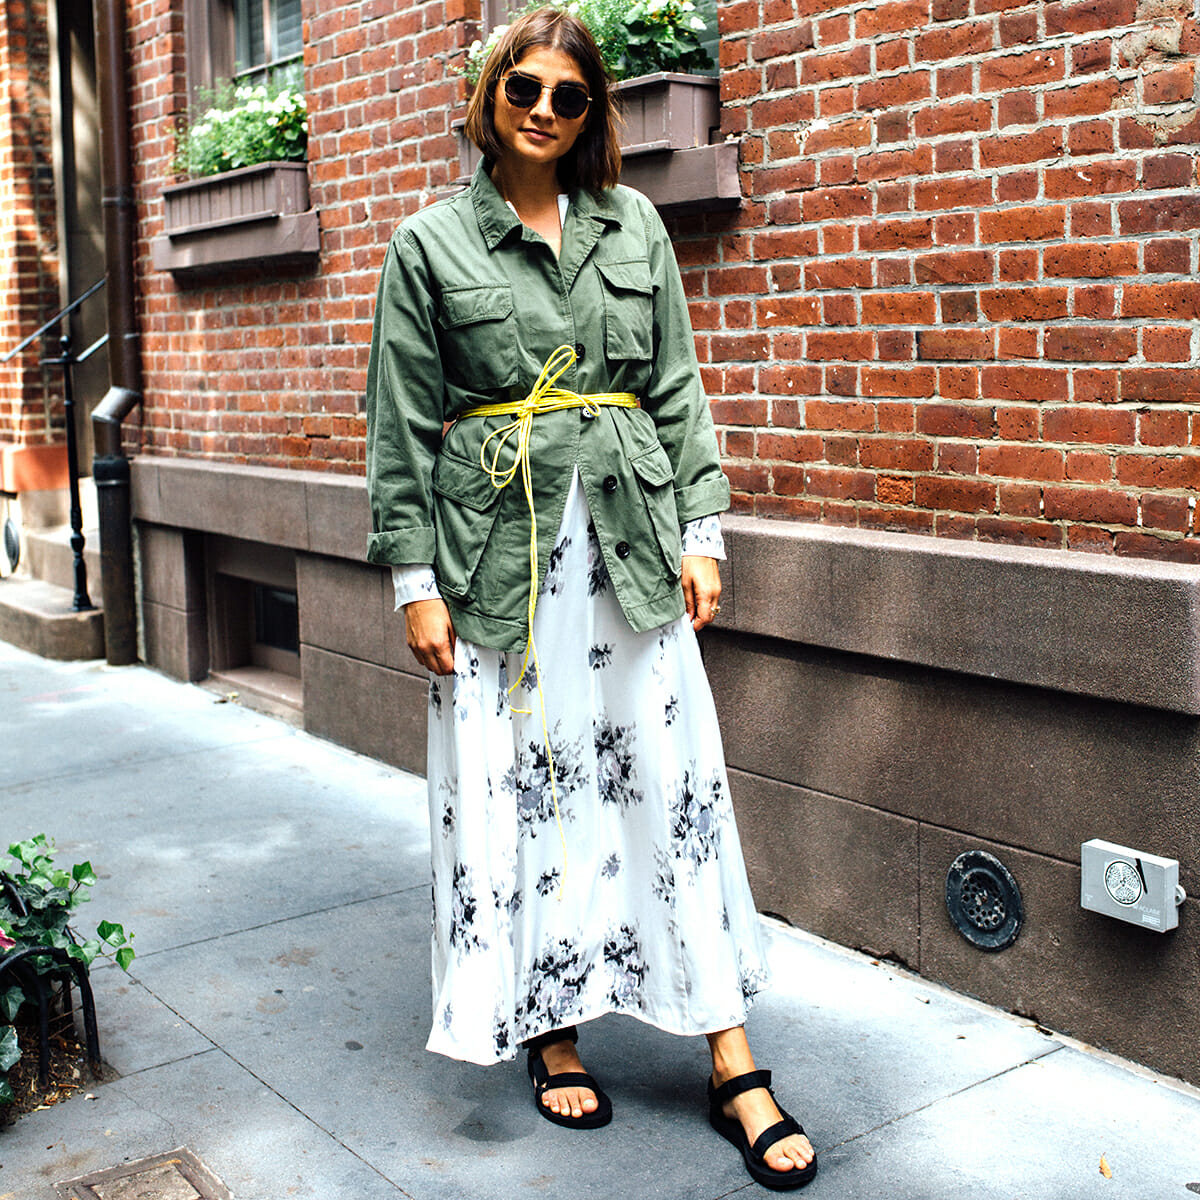 Three of the Best Ways to Style Tevas